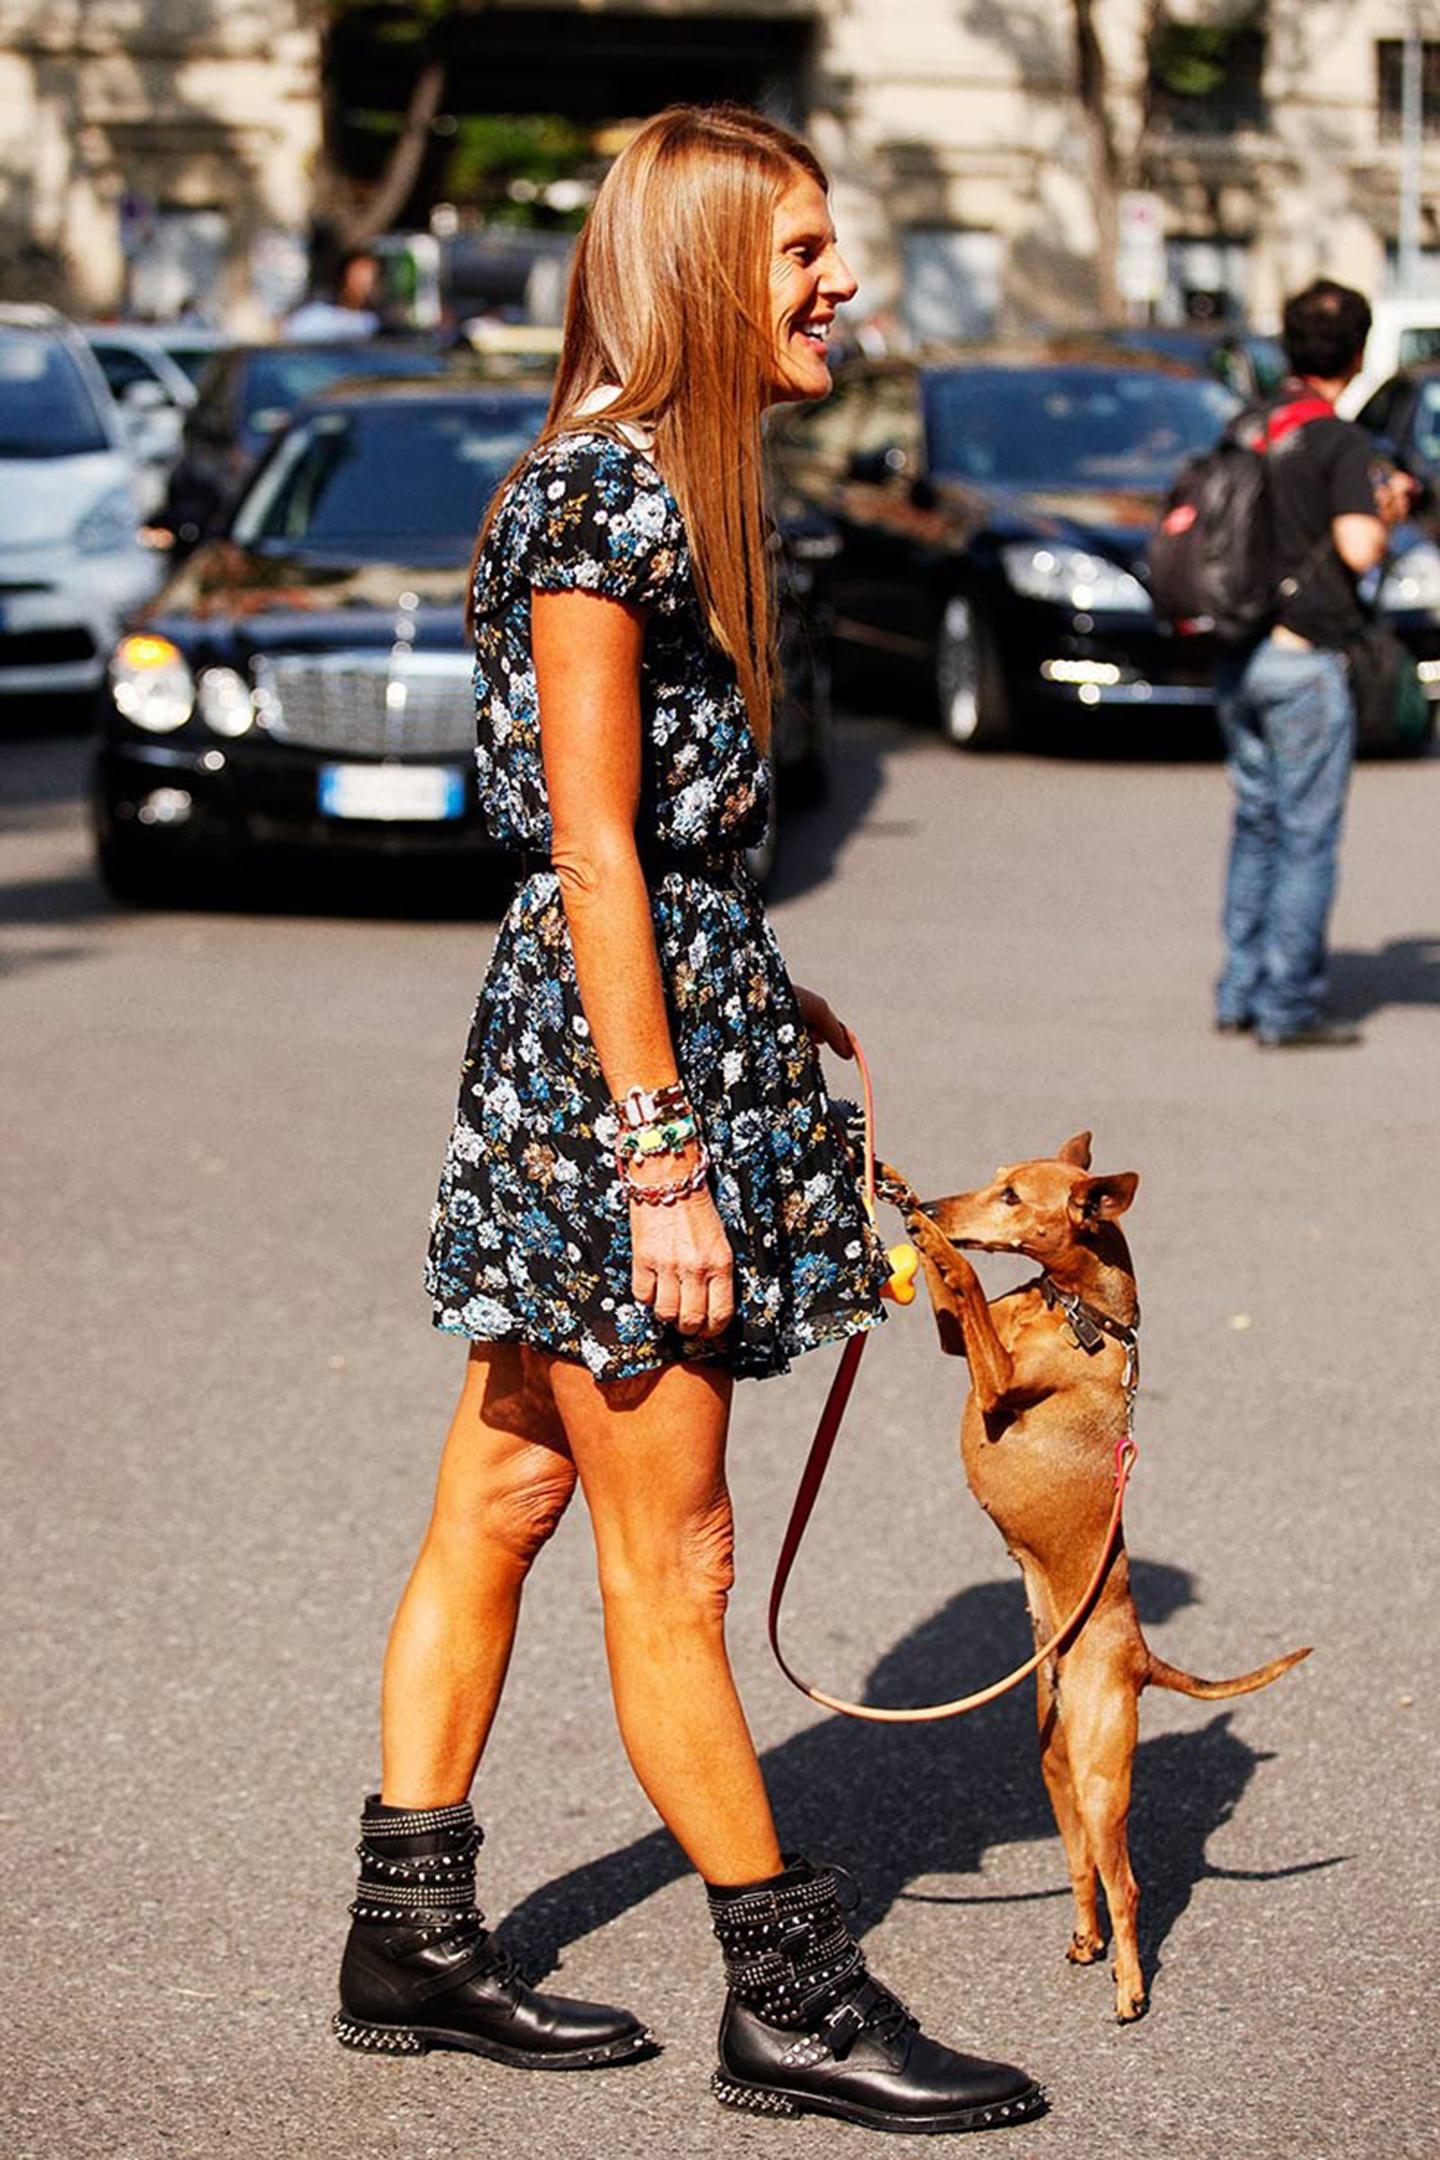 animali-fashion-week-street-style-ferplast-cani